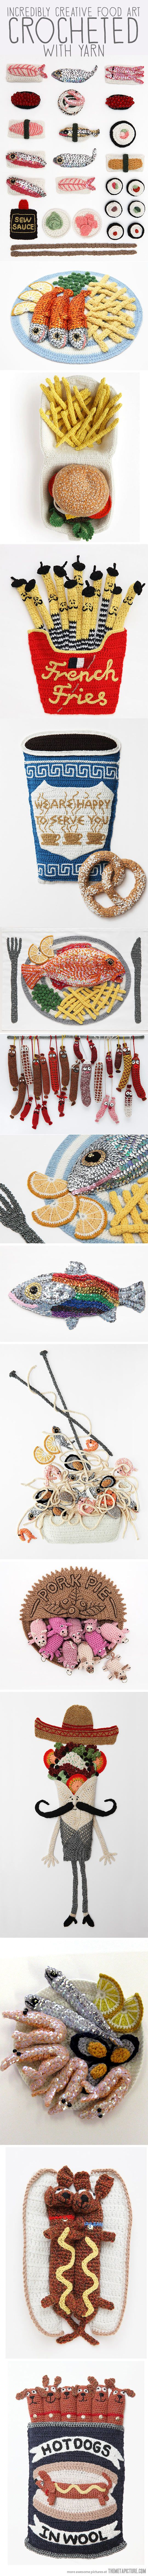 Incredibly creative food art crocheted with yarn…